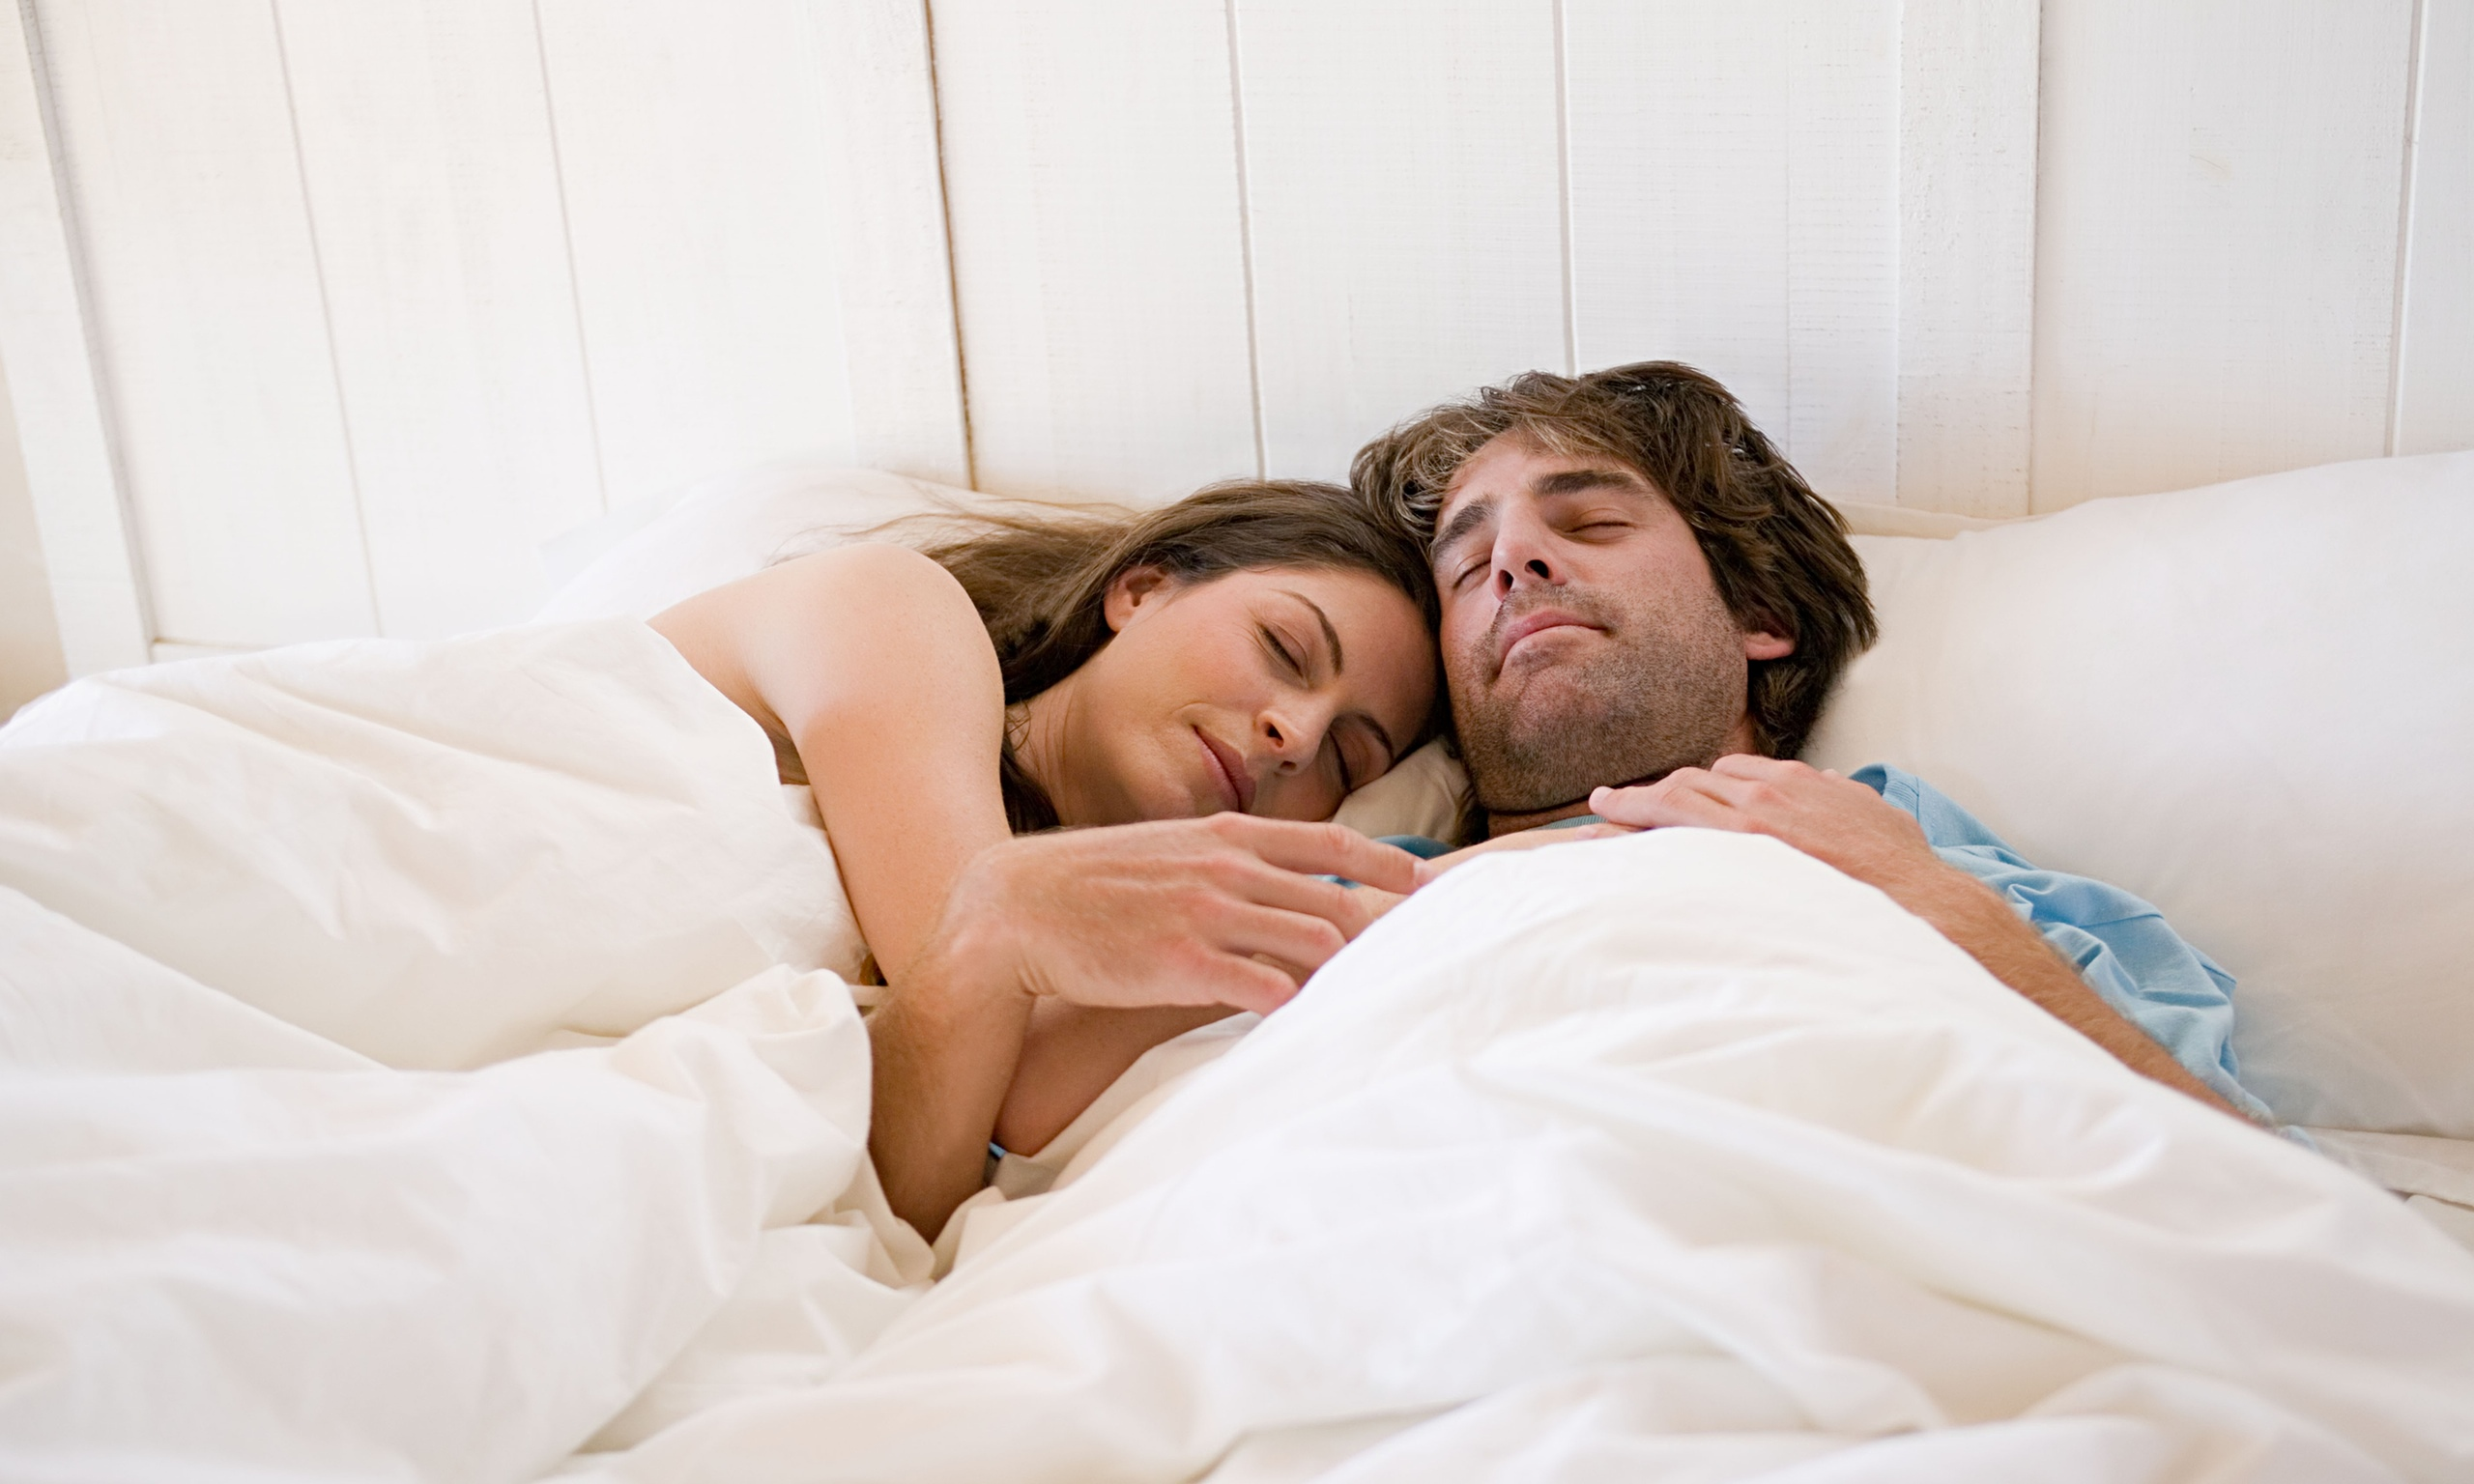 full intercourse video between men and women